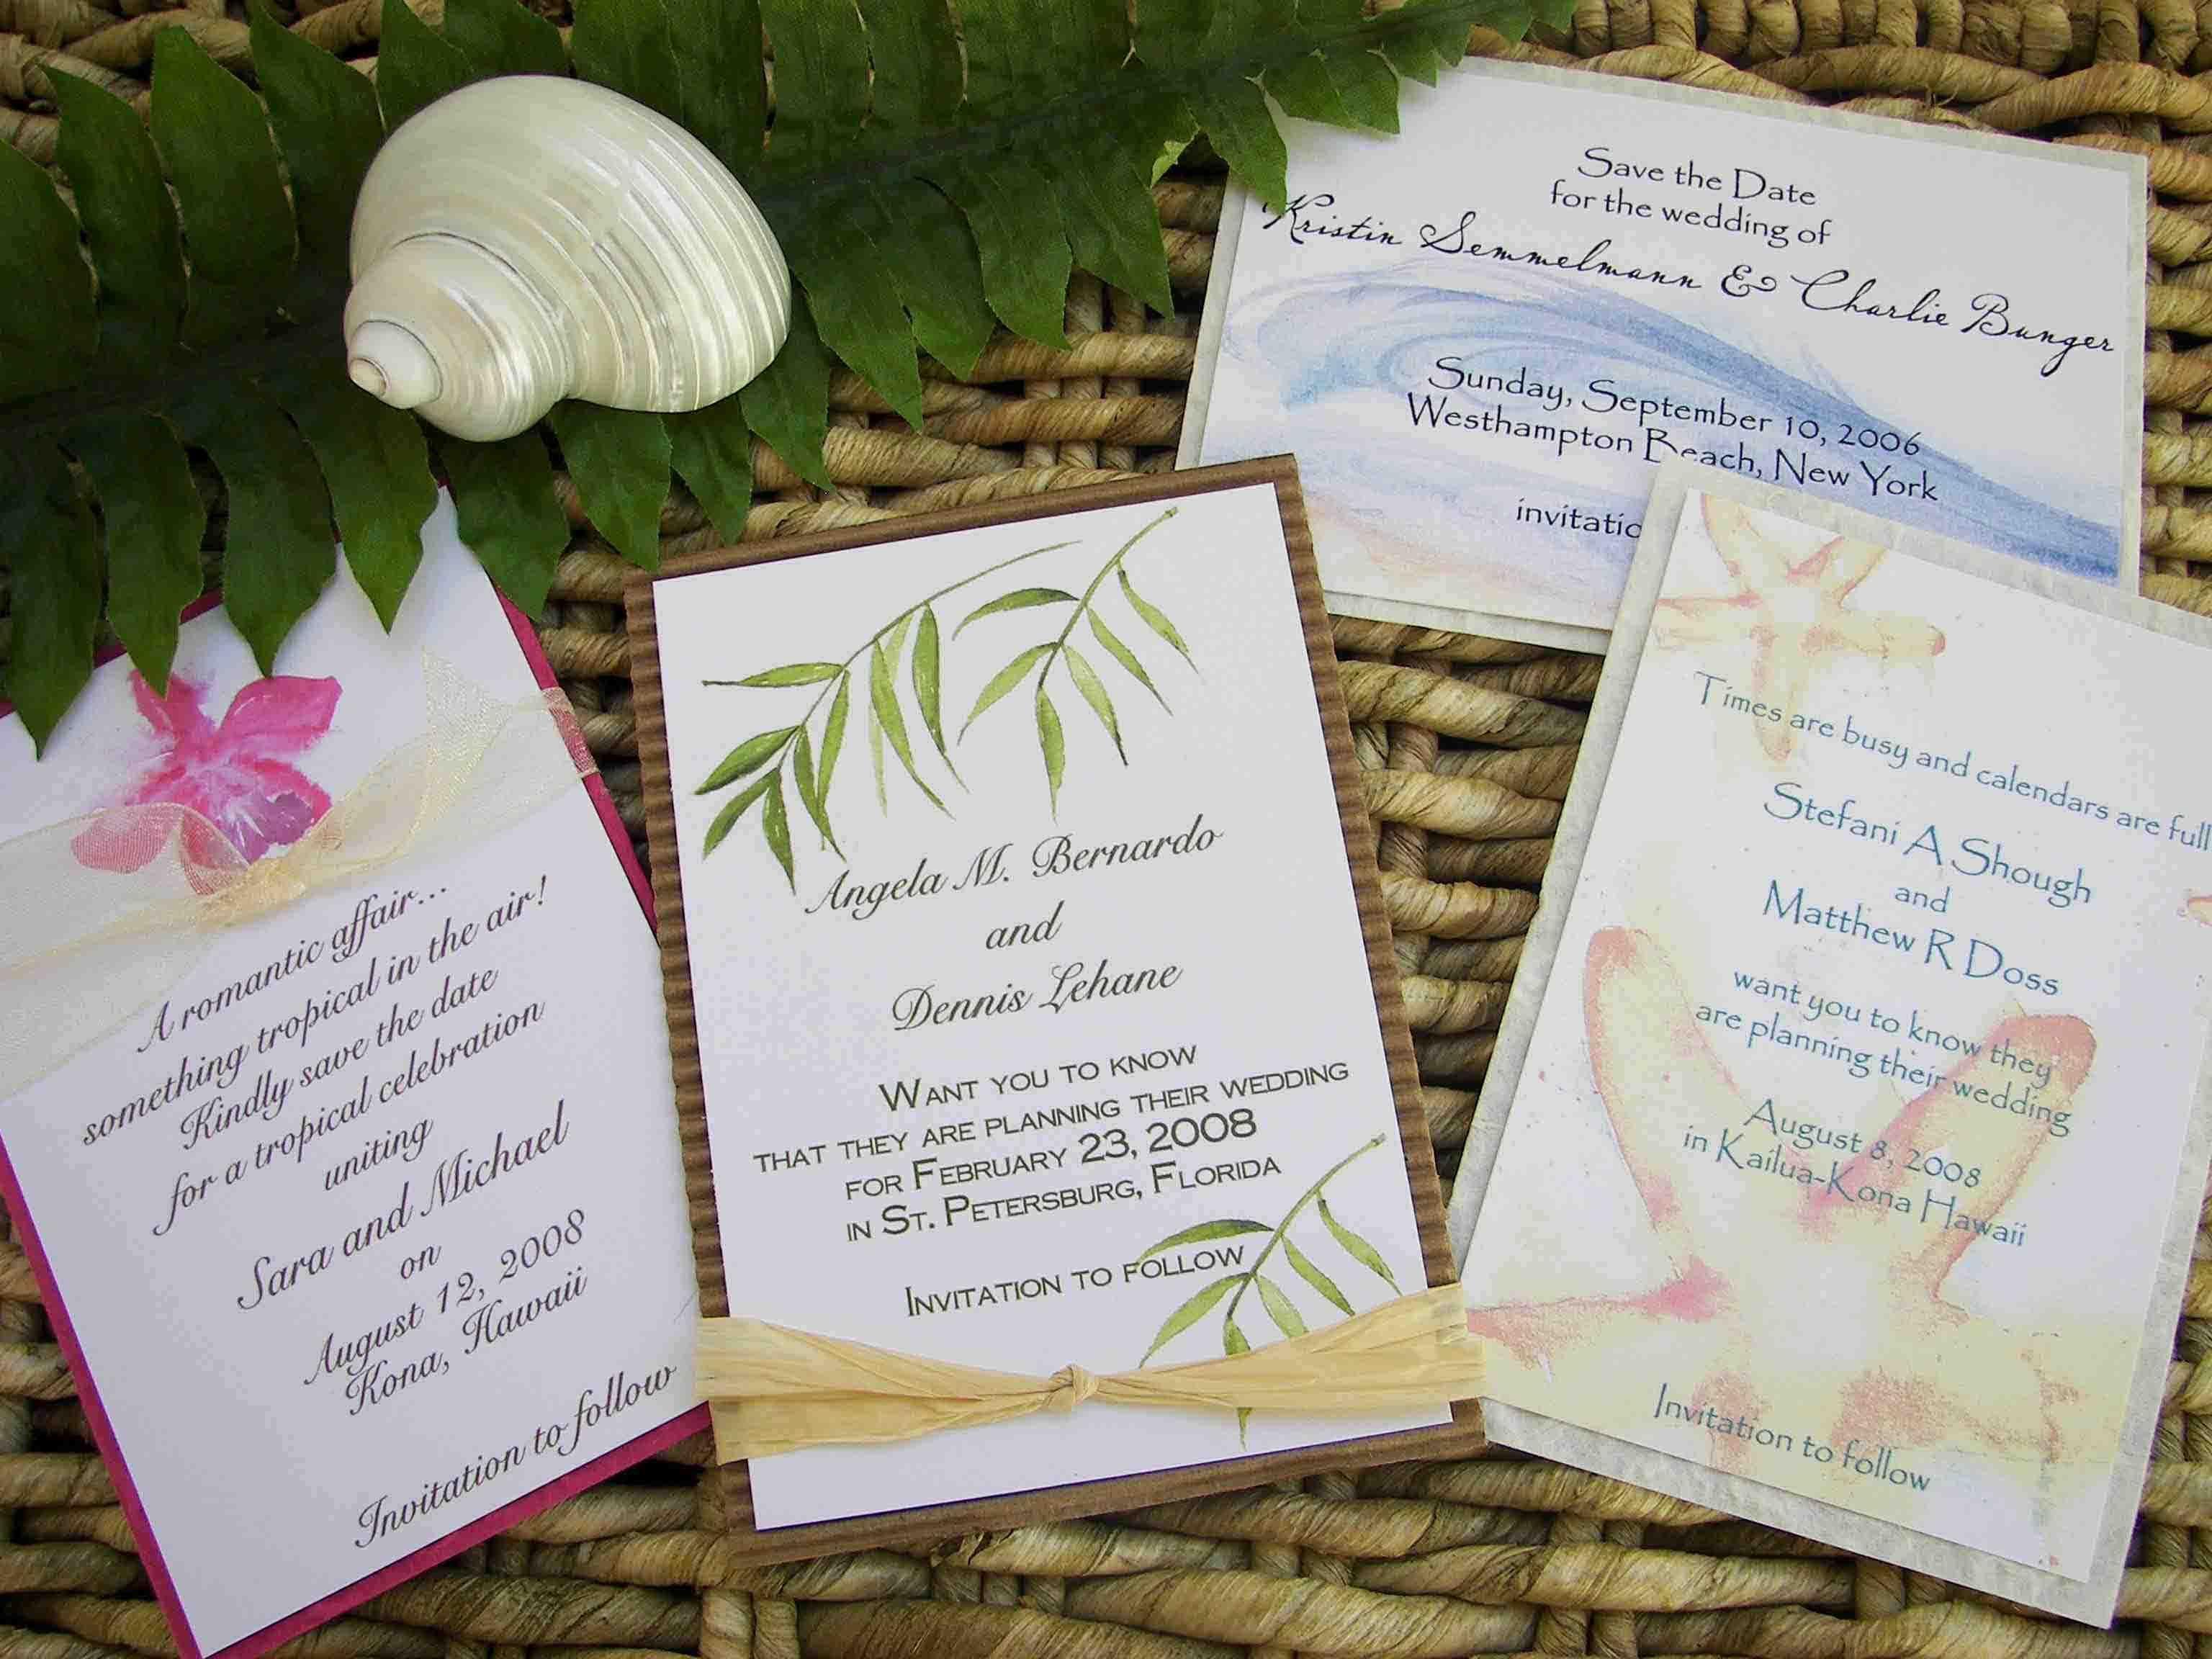 Beach themed wedding invitations do it yourself wedding beach themed wedding invitations do it yourself solutioingenieria Images